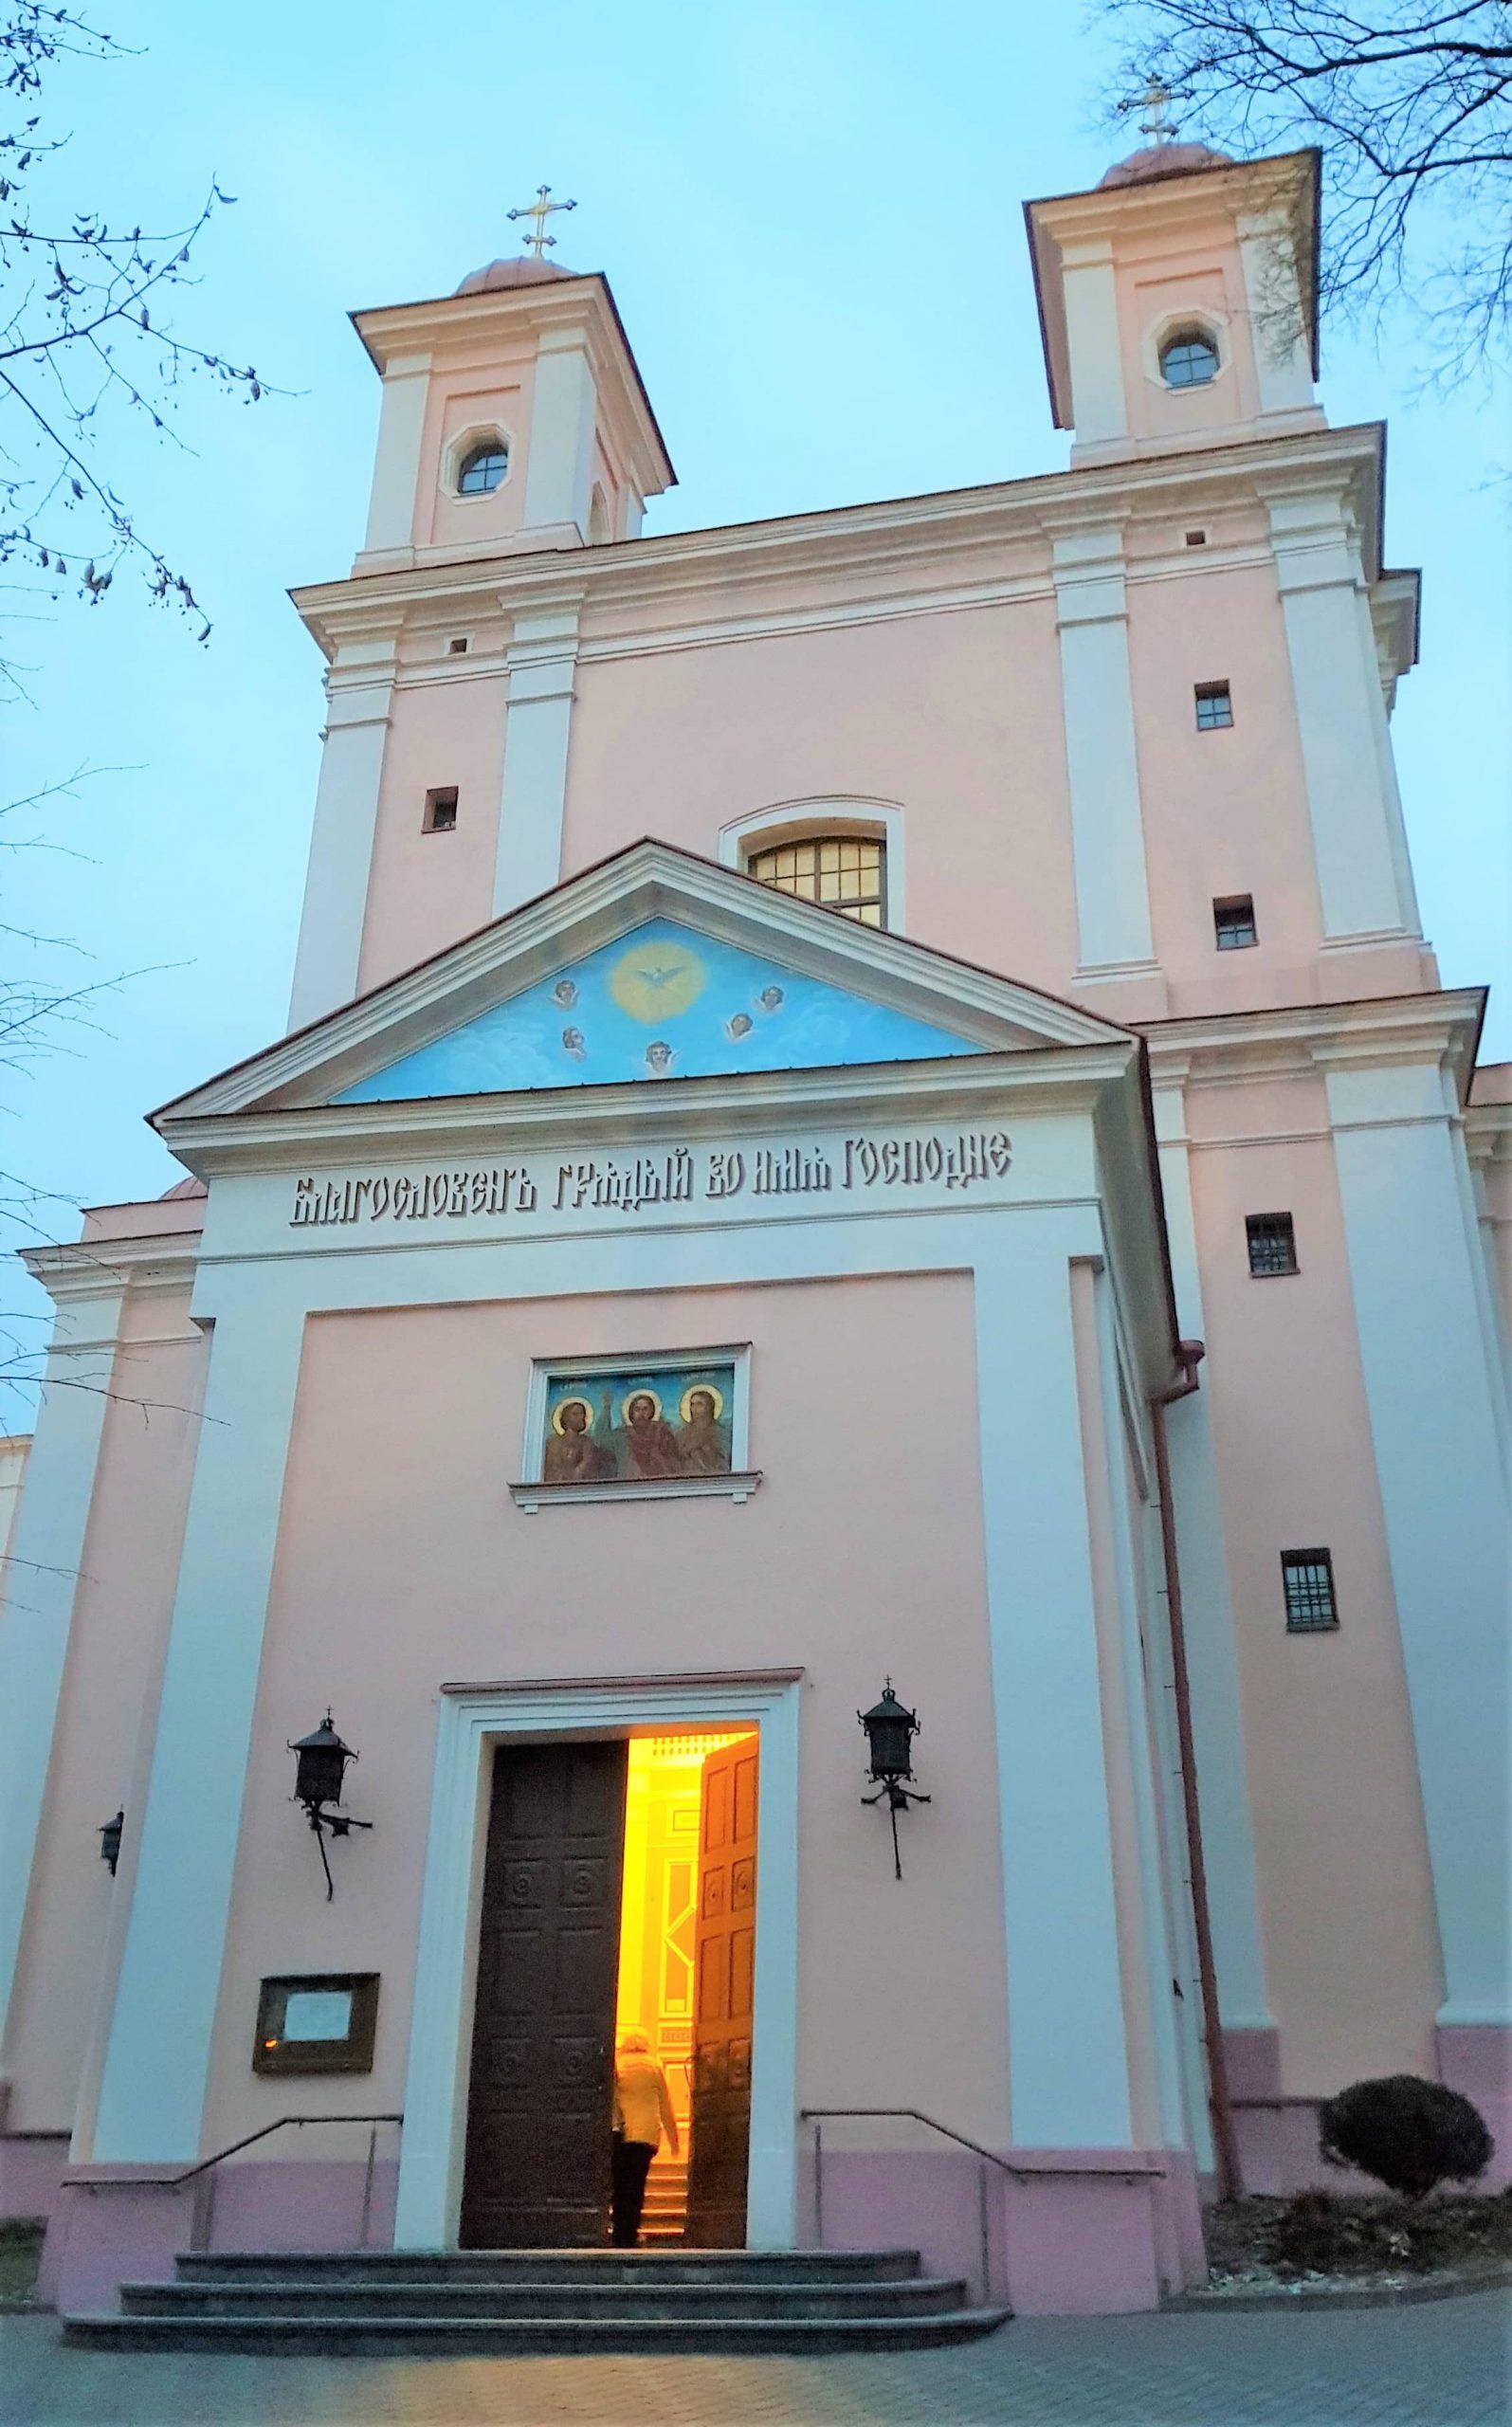 Fachada principal de la iglesia rusio ortodoxa del espiritu santo